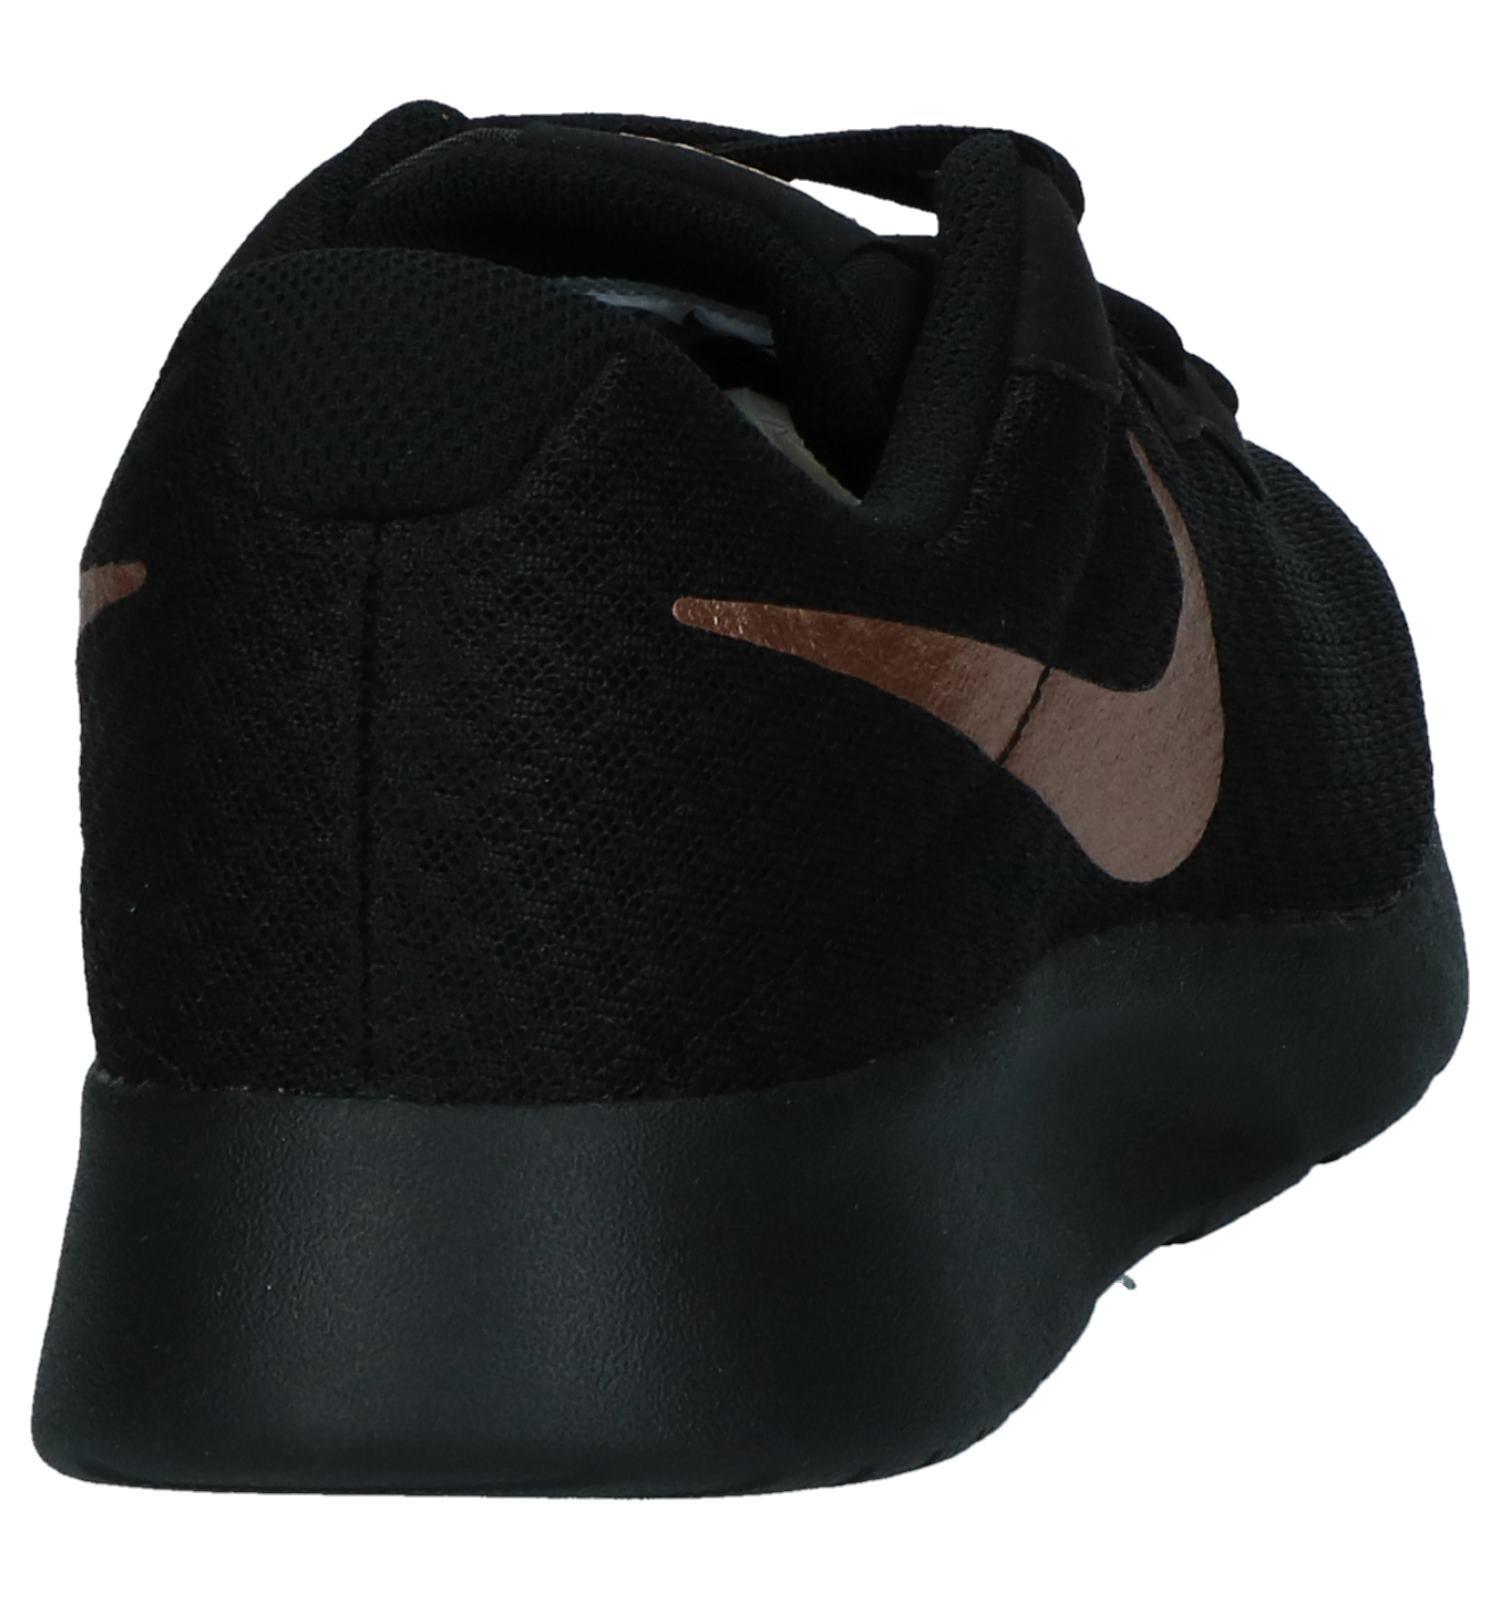 Zwarte Nike Nike Tanjun Zwarte Sneakers IY6bvf7ygm